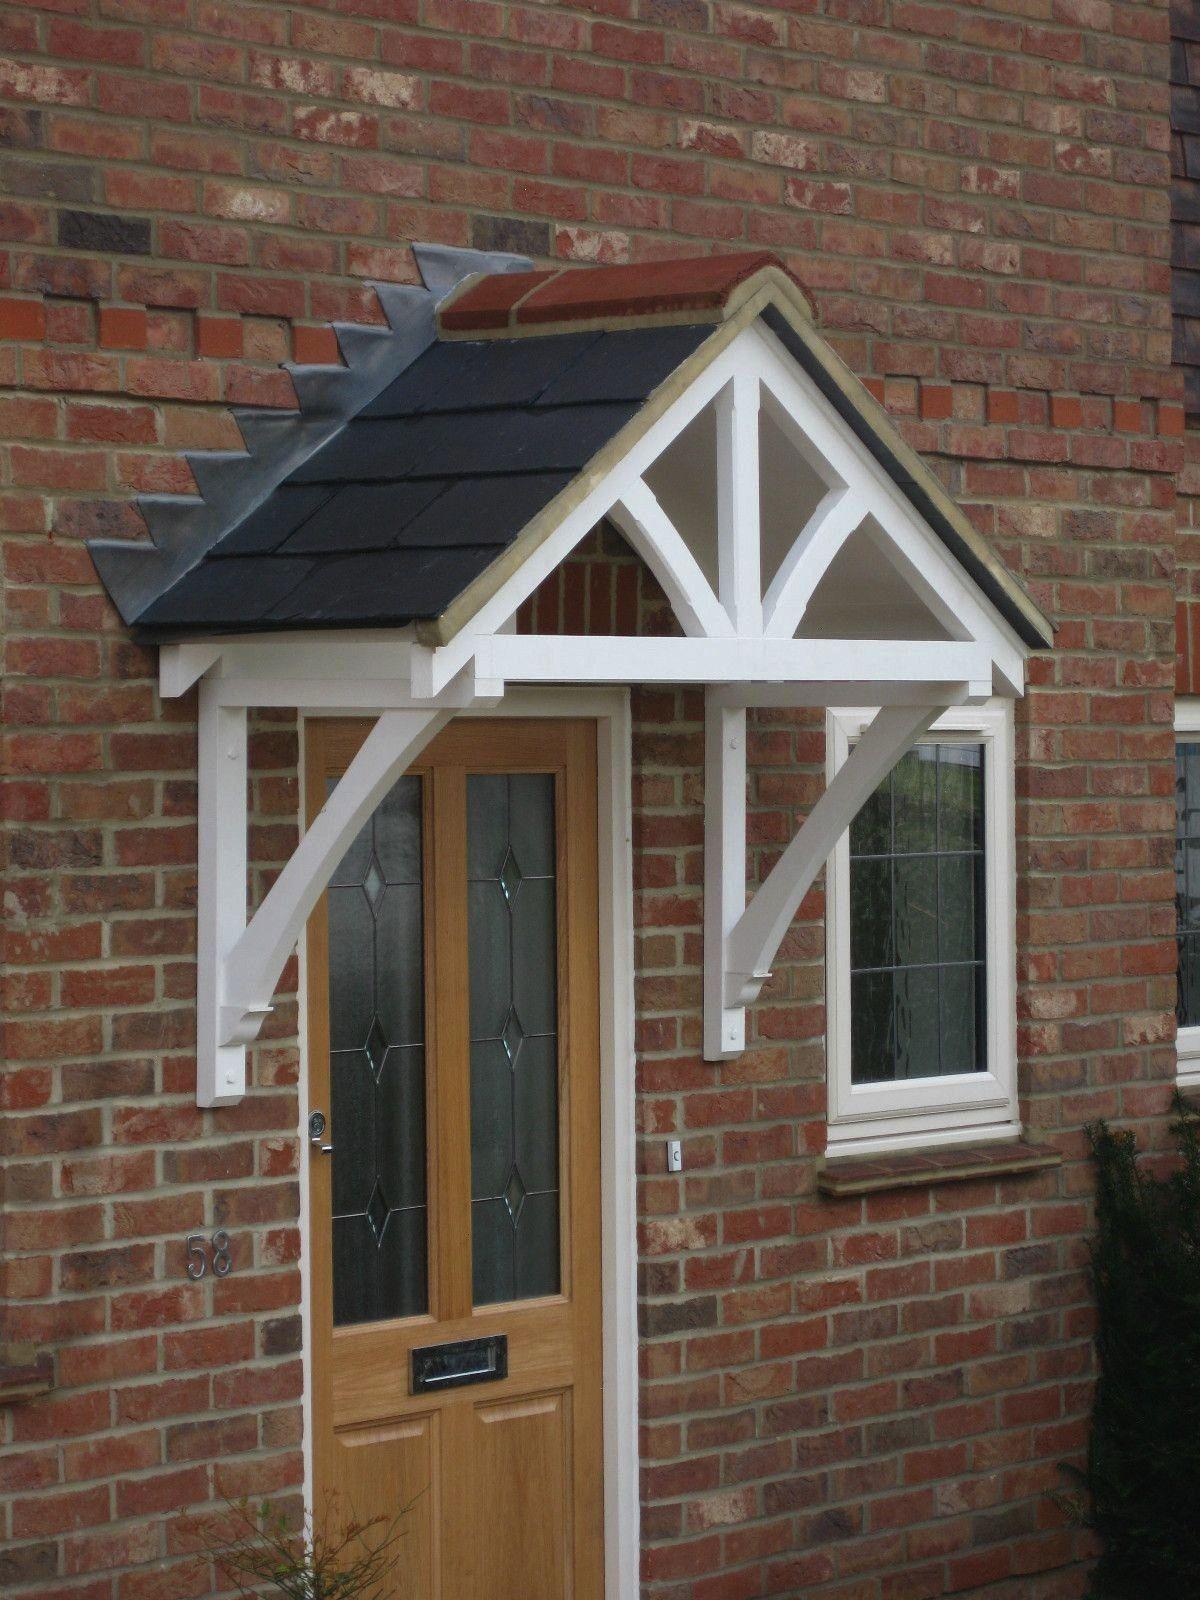 Ukpicclickcom Fdl14060 Entrance Timber Design Canopy Period Porch Front Nice Door Back Kits For Ornice Desi 2020 Kanopi Sundurma On Kapi Sundurmalari